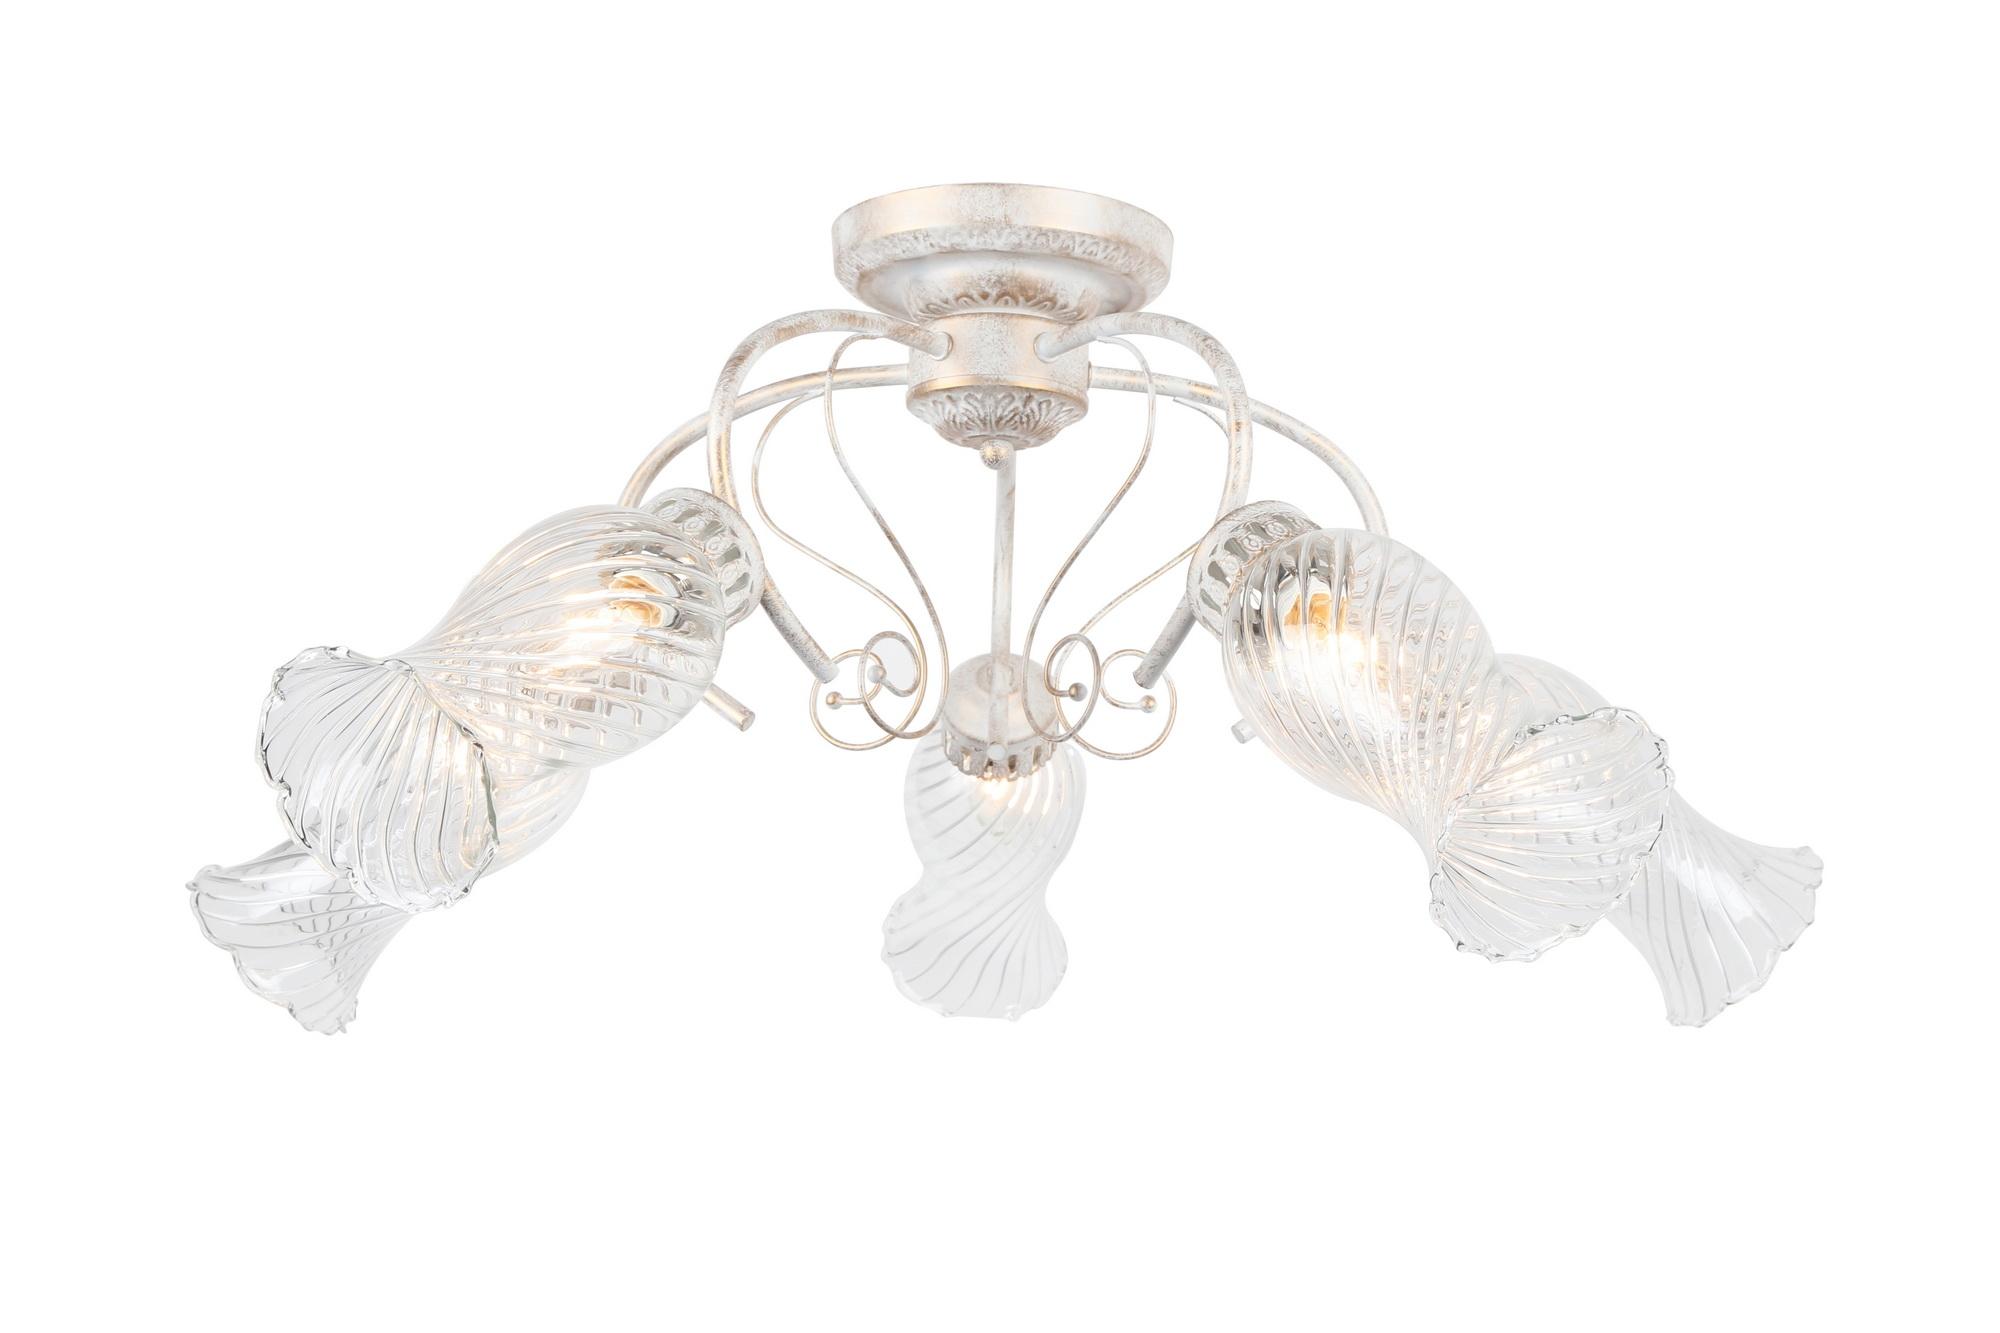 Люстра Arte lamp Gemma a6335pl-5wg